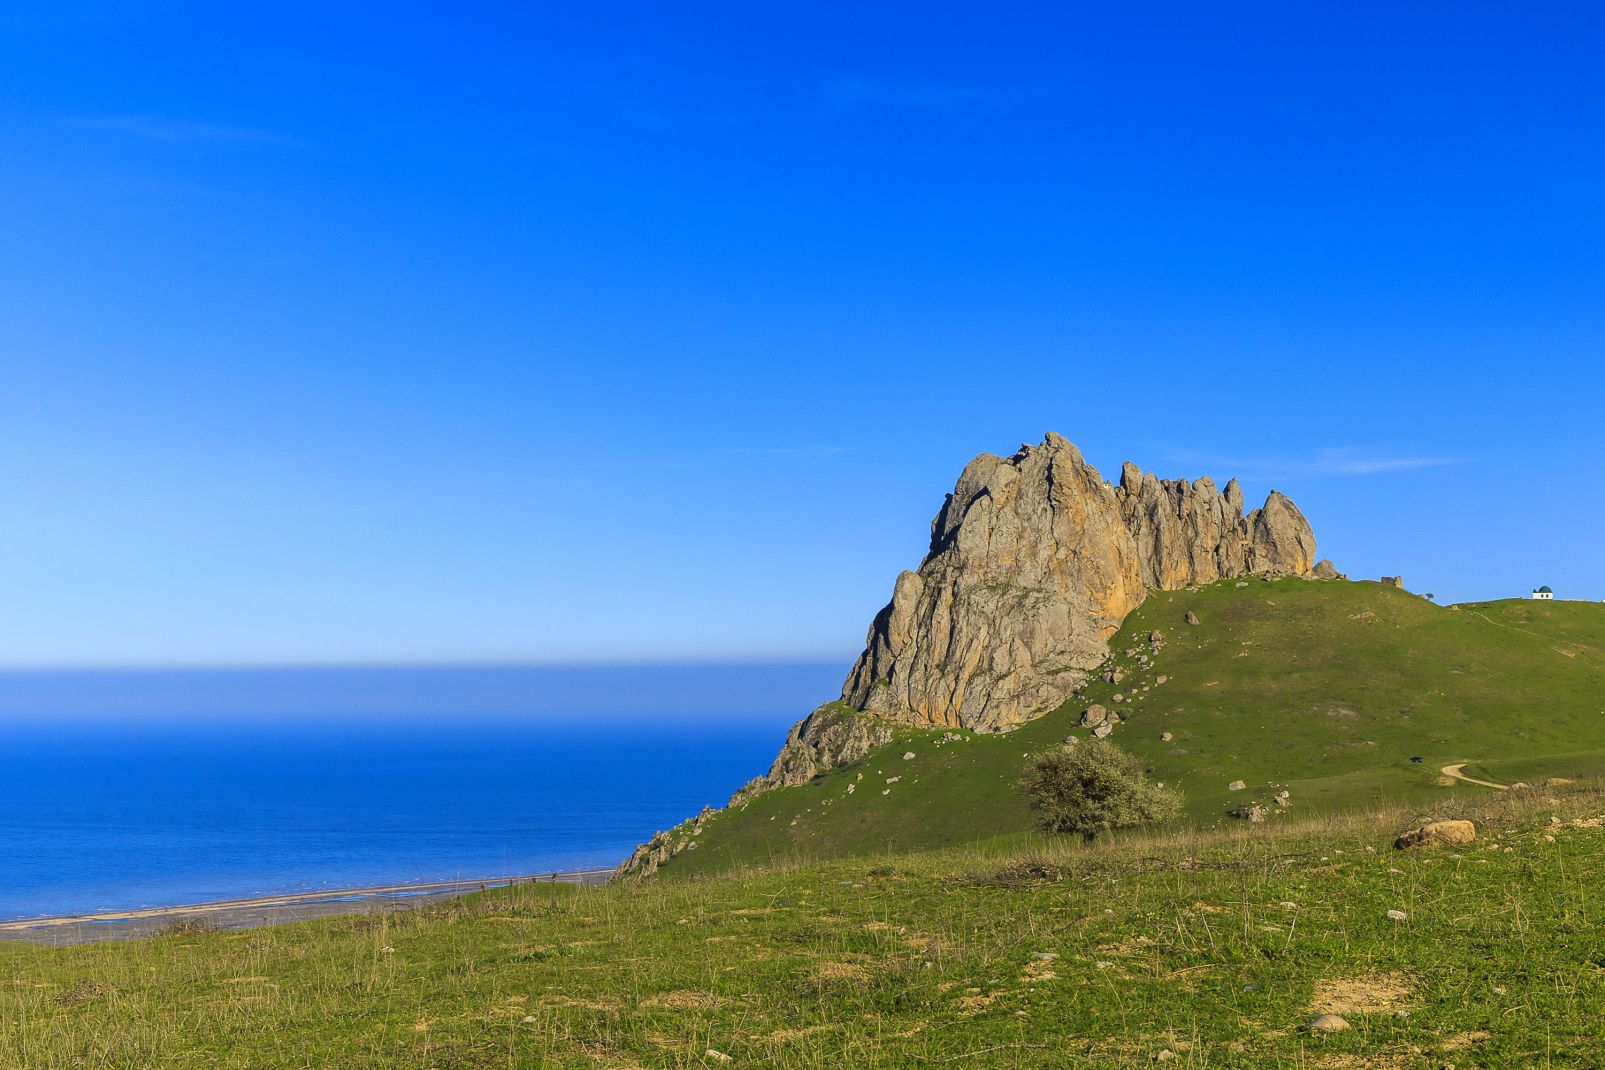 Azerbaidjan, asie, moyen-orient